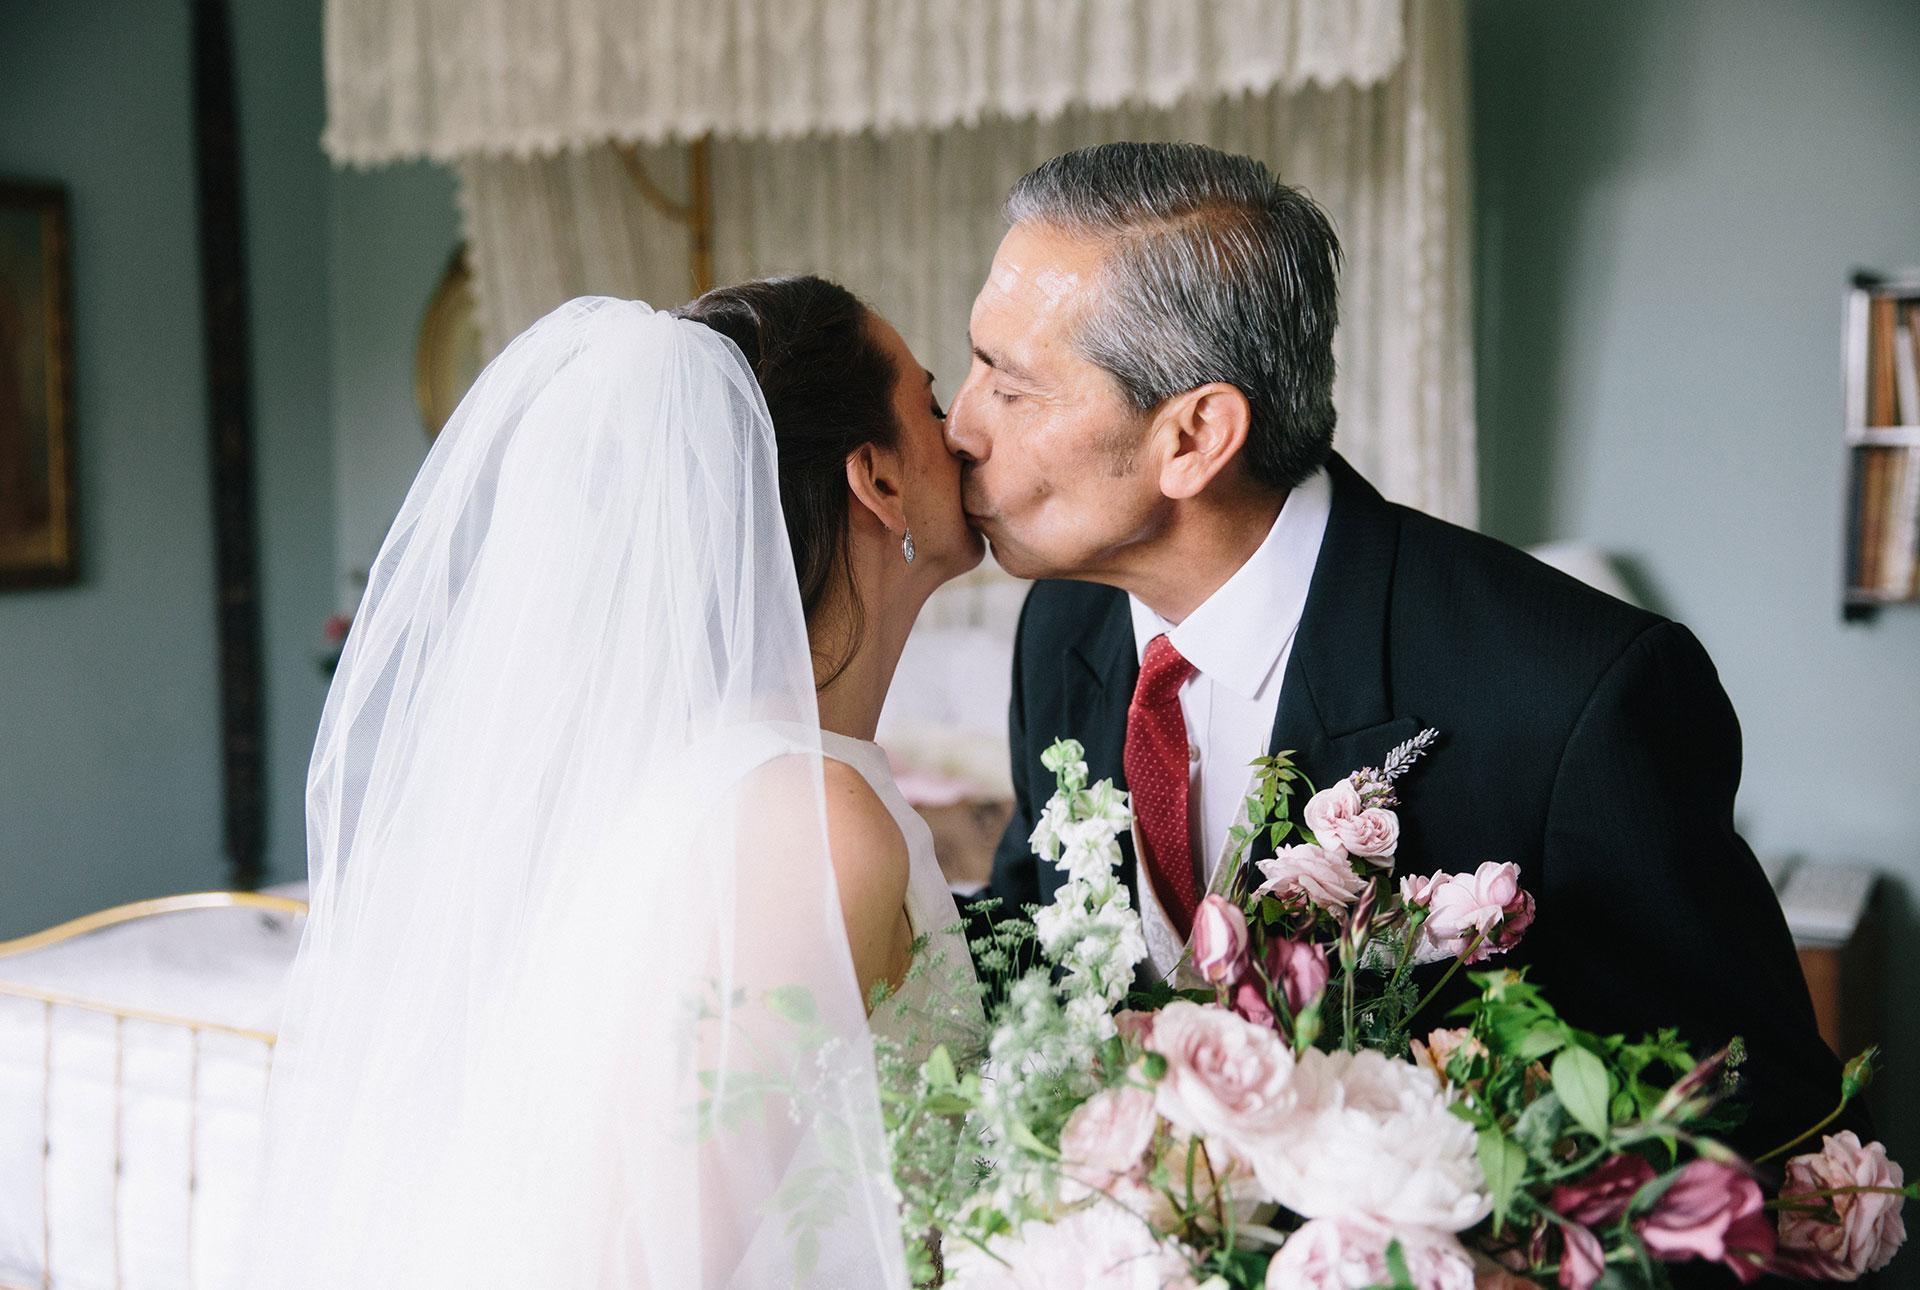 Langar-Hall-wedding-photographer-in-Nottinghamshire-Michael-Newington-Gray-24.jpg